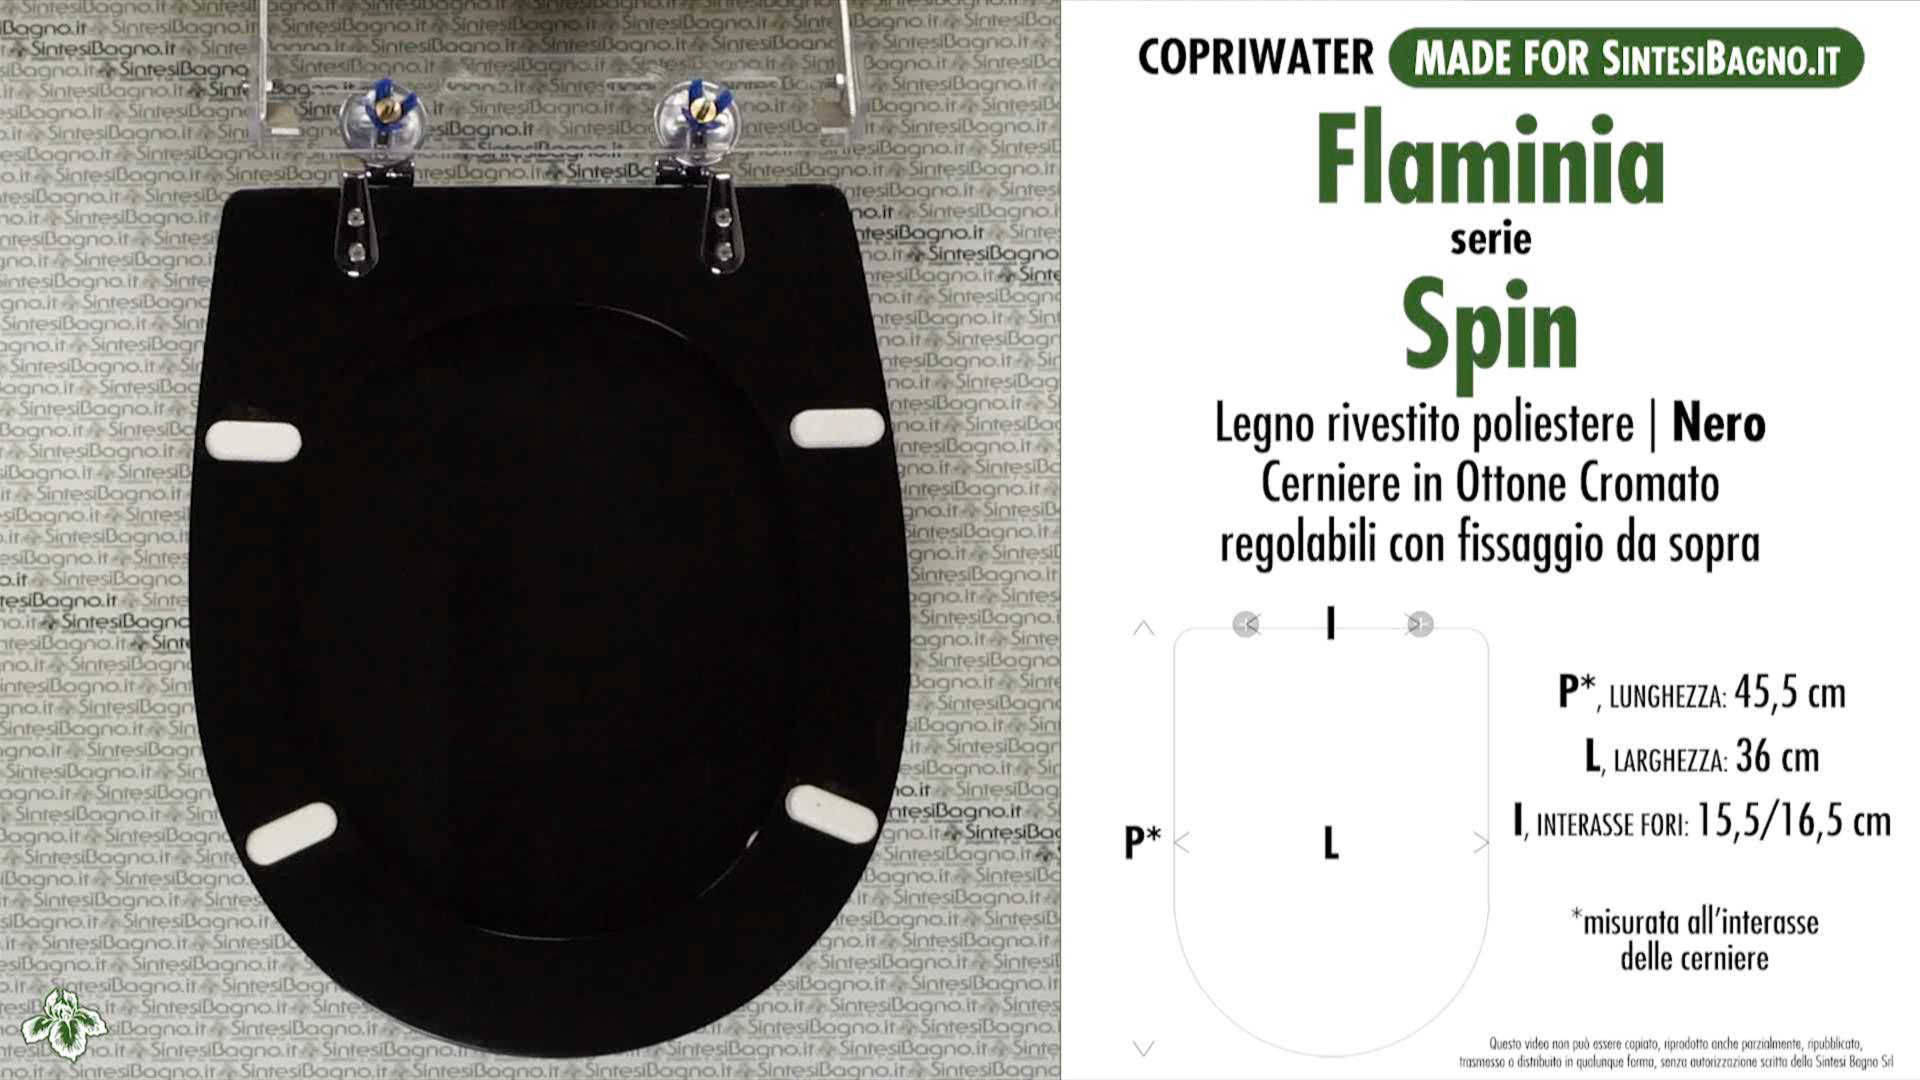 SCHEDA TECNICA MISURE copriwater FLAMINIA SPIN